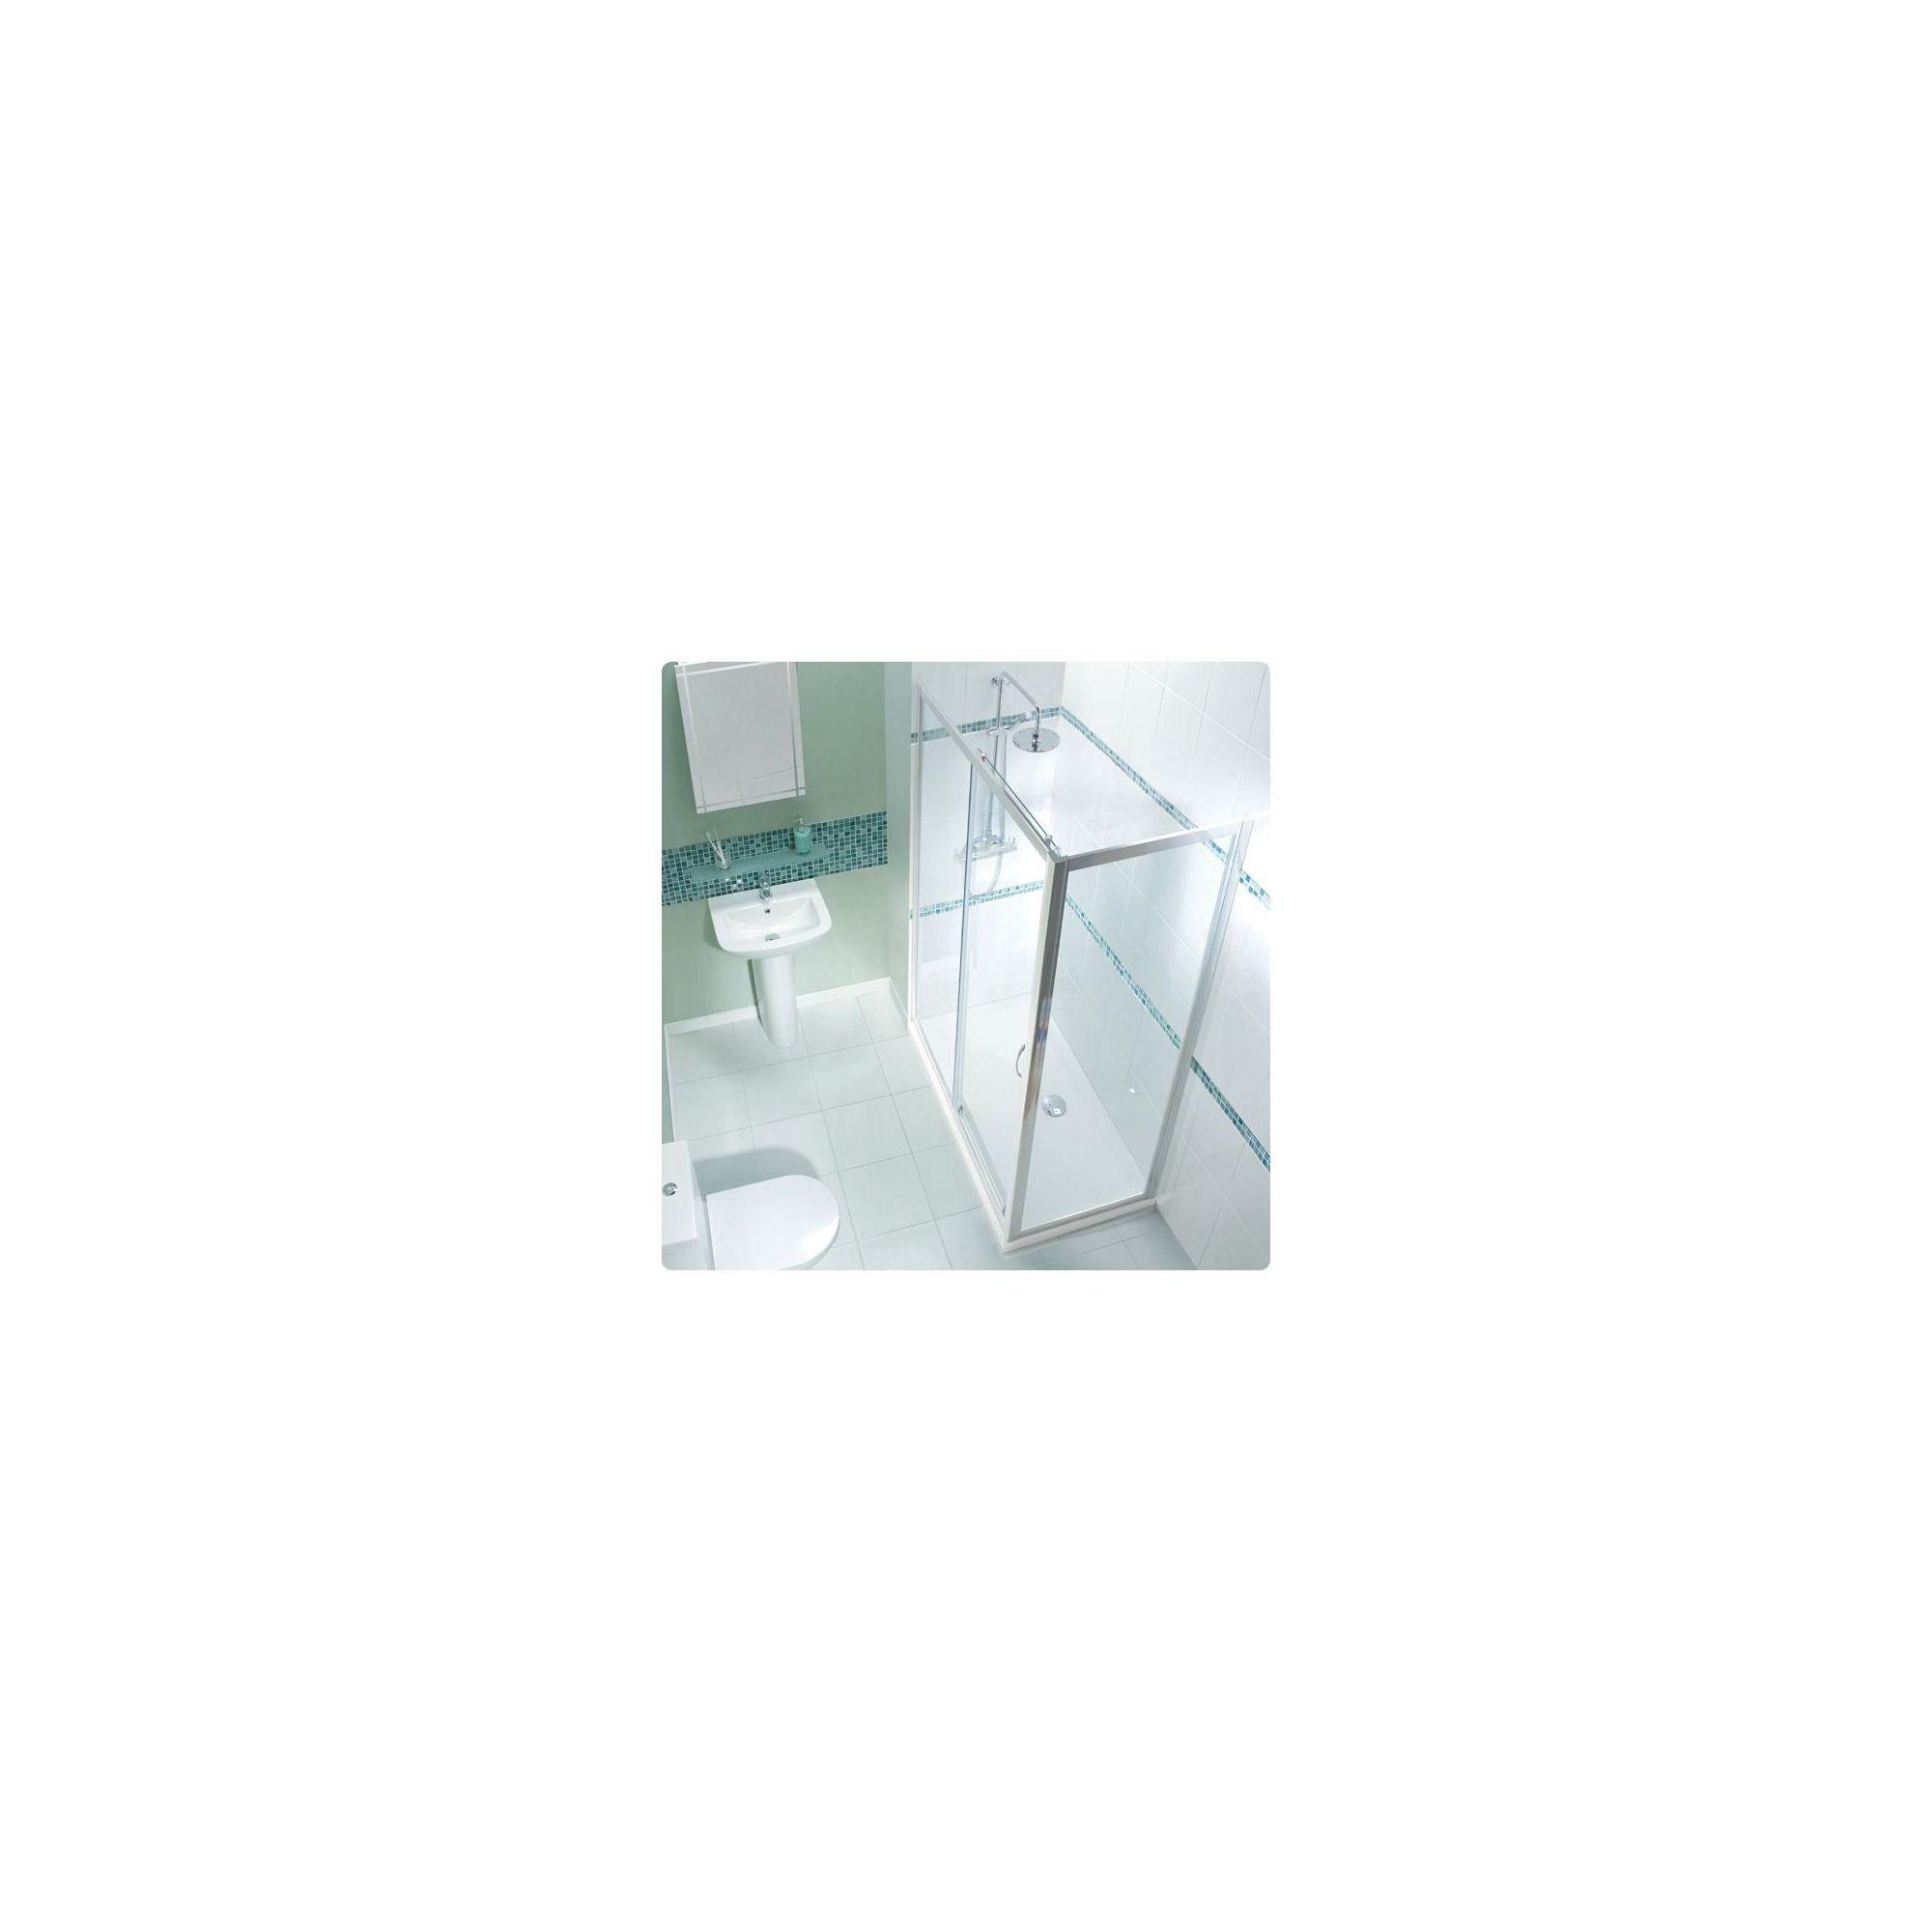 Balterley Framed Sliding Shower Enclosure, 1200mm x 760mm, Standard Tray, 6mm Glass at Tesco Direct